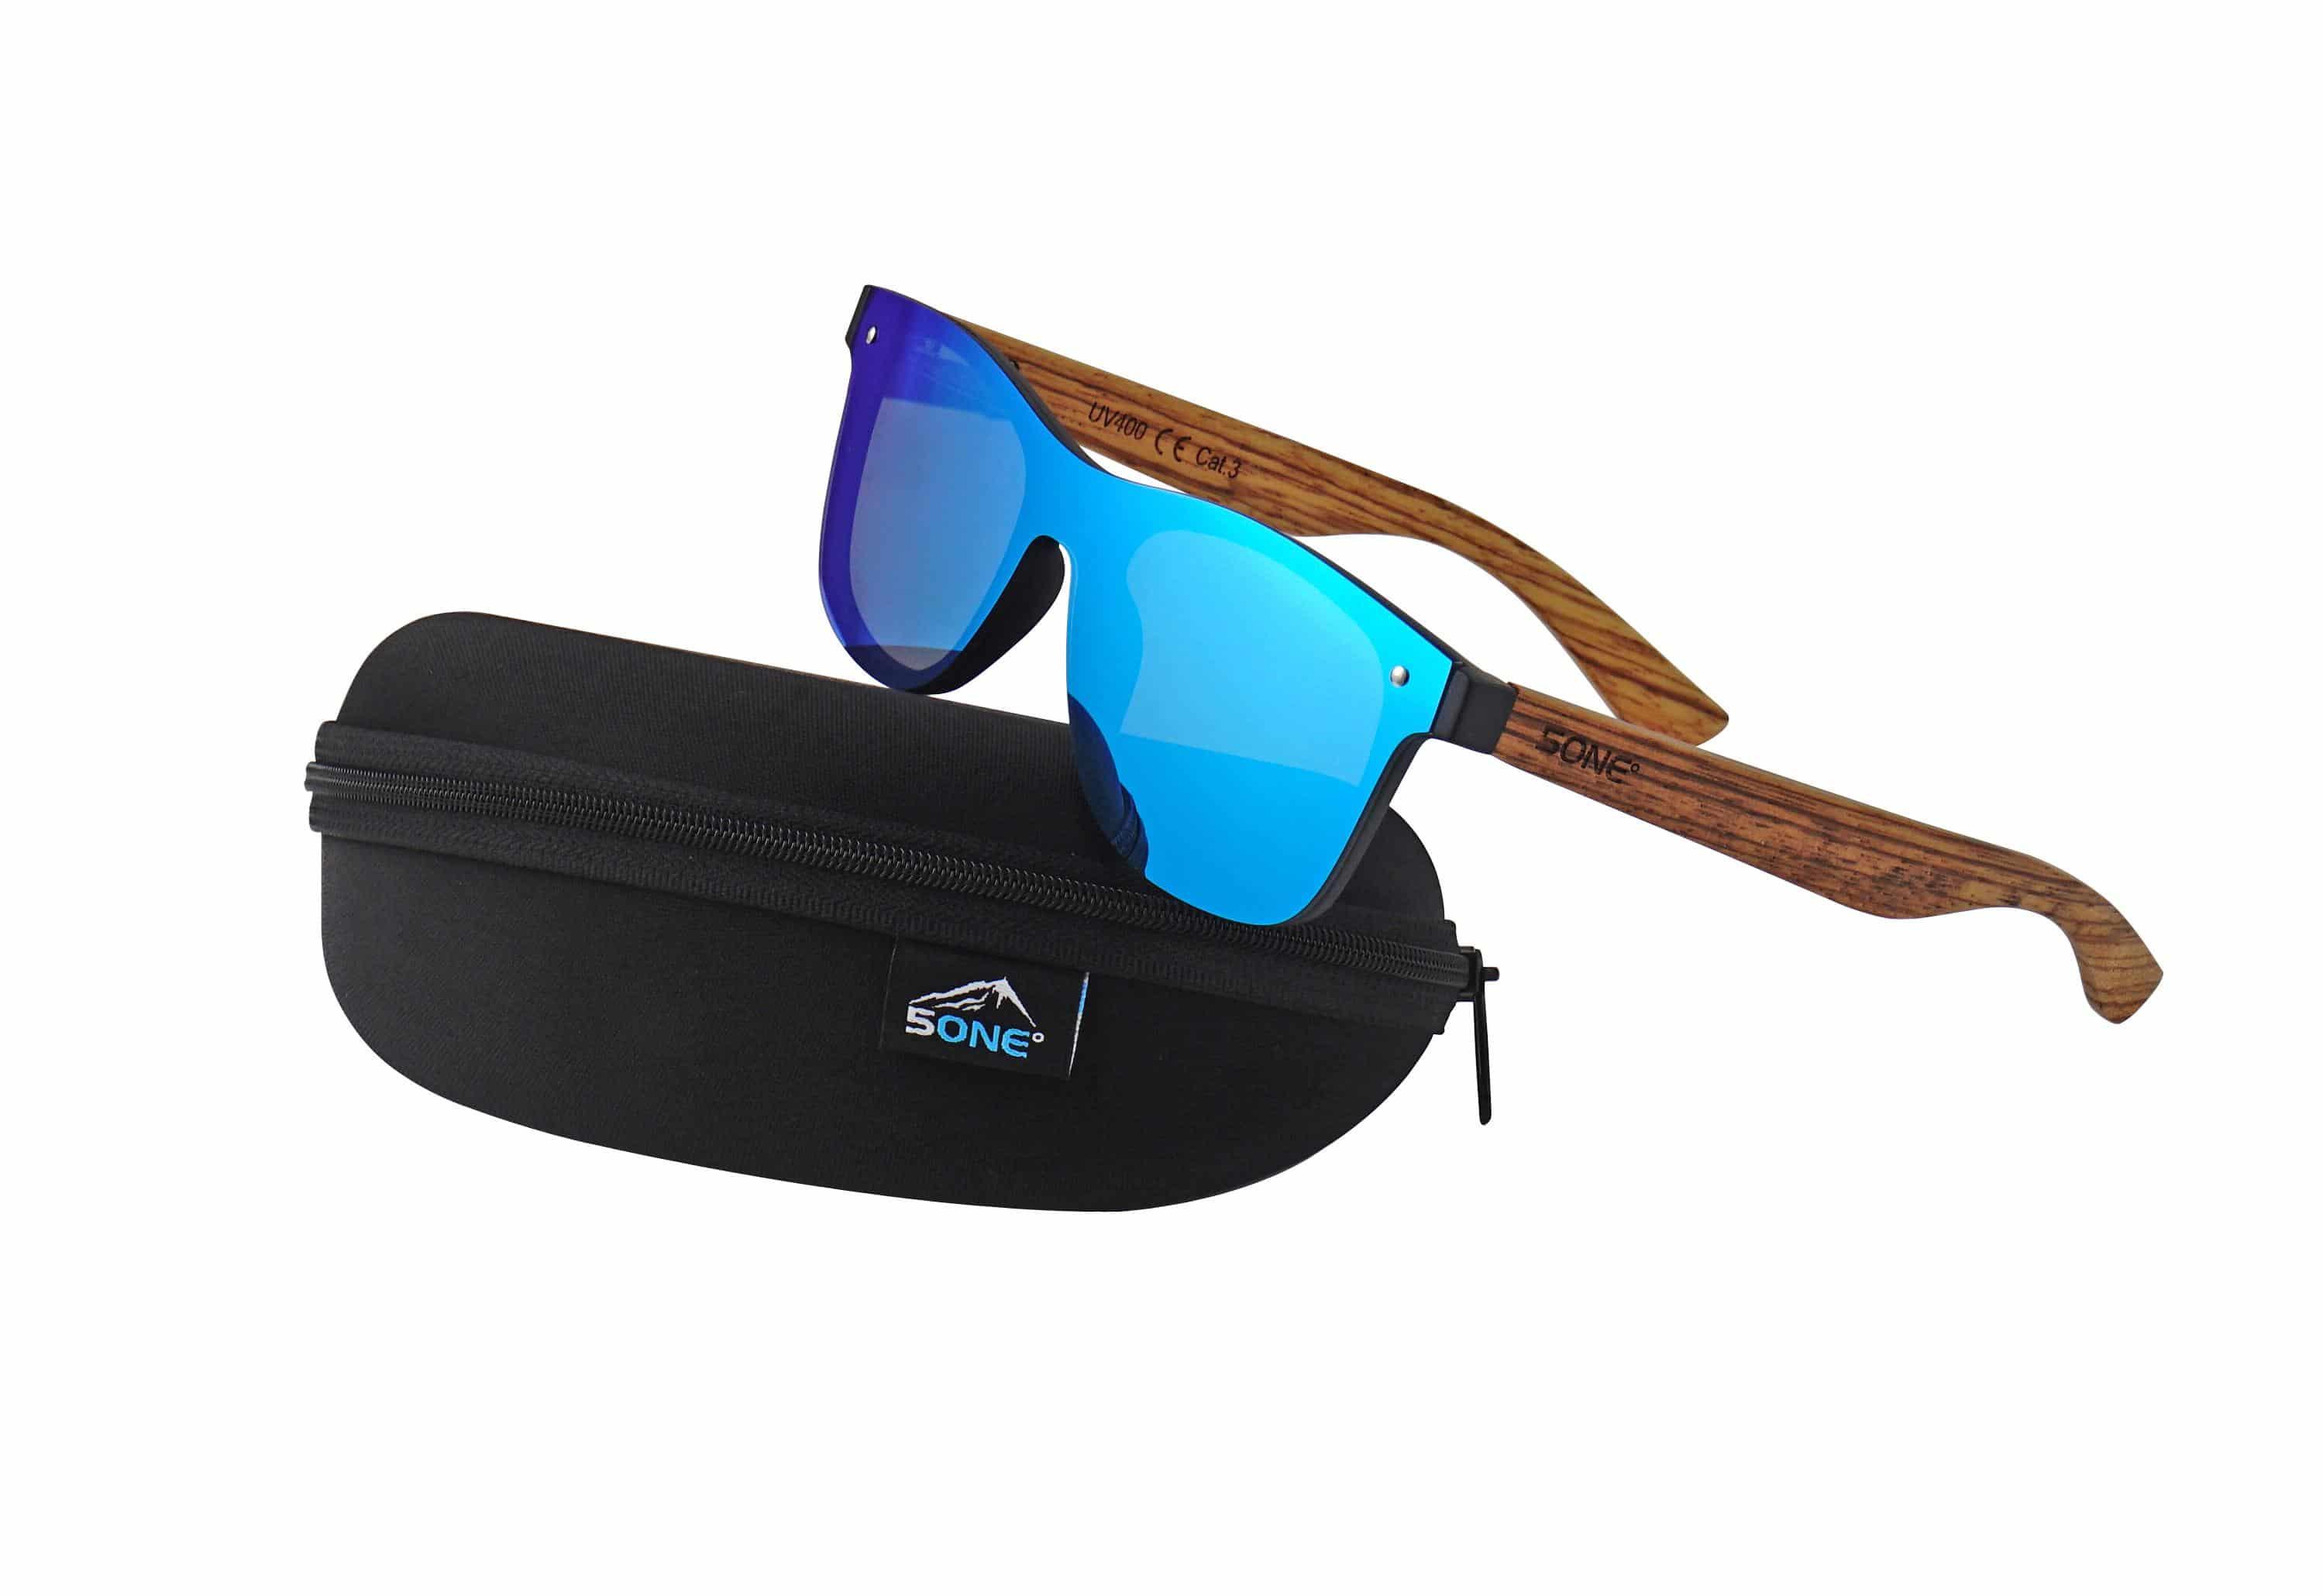 5one® Hvar Zebra Ice Blue - wayfarer flat zonnebril